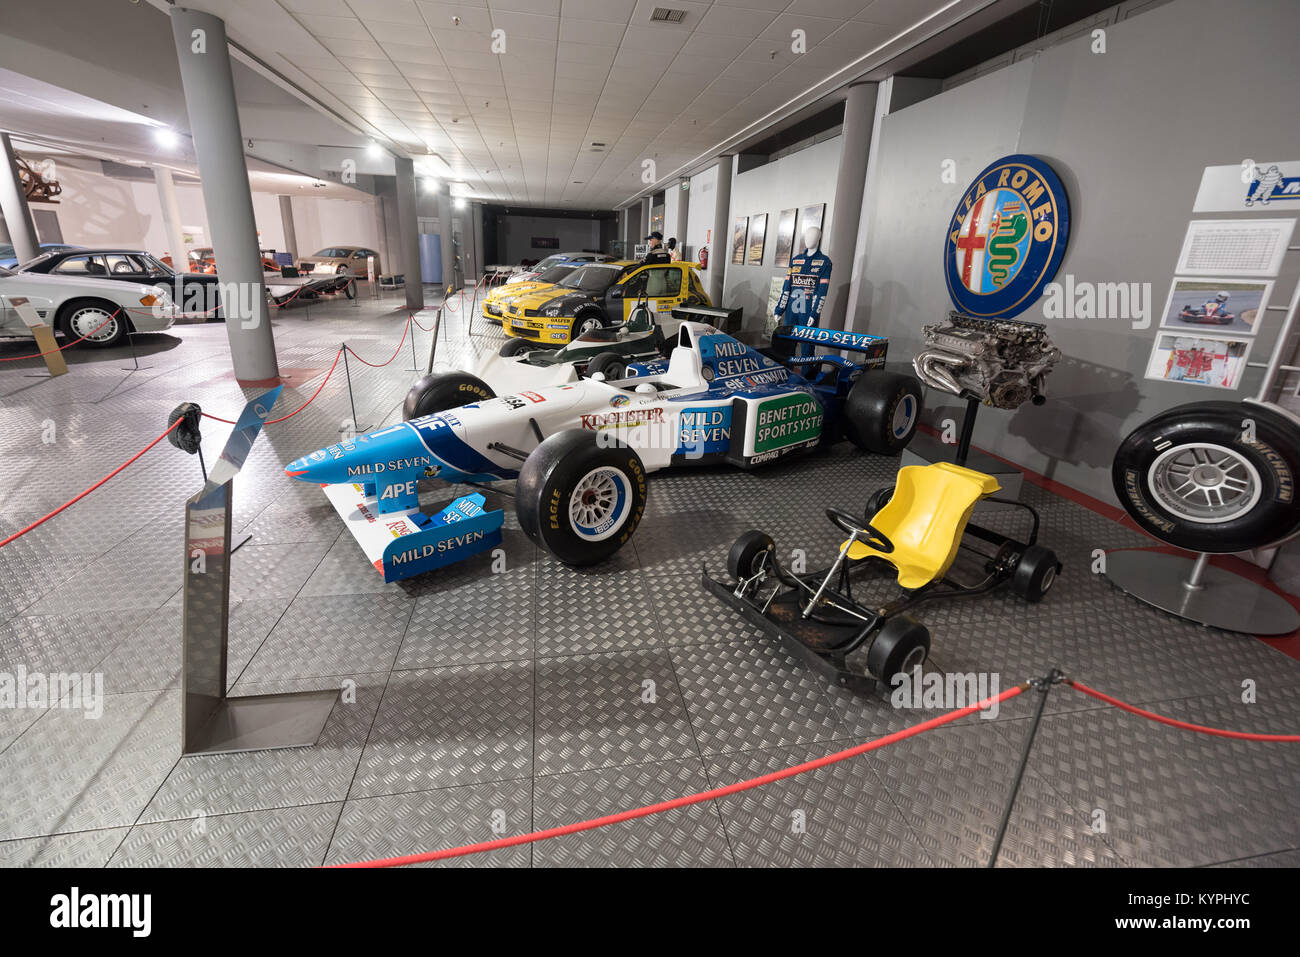 Salamanca, Spain - December 29 2017 : Michael Schumacher Benetton Renault 1995 formula 1 car in museum of the history - Stock Image